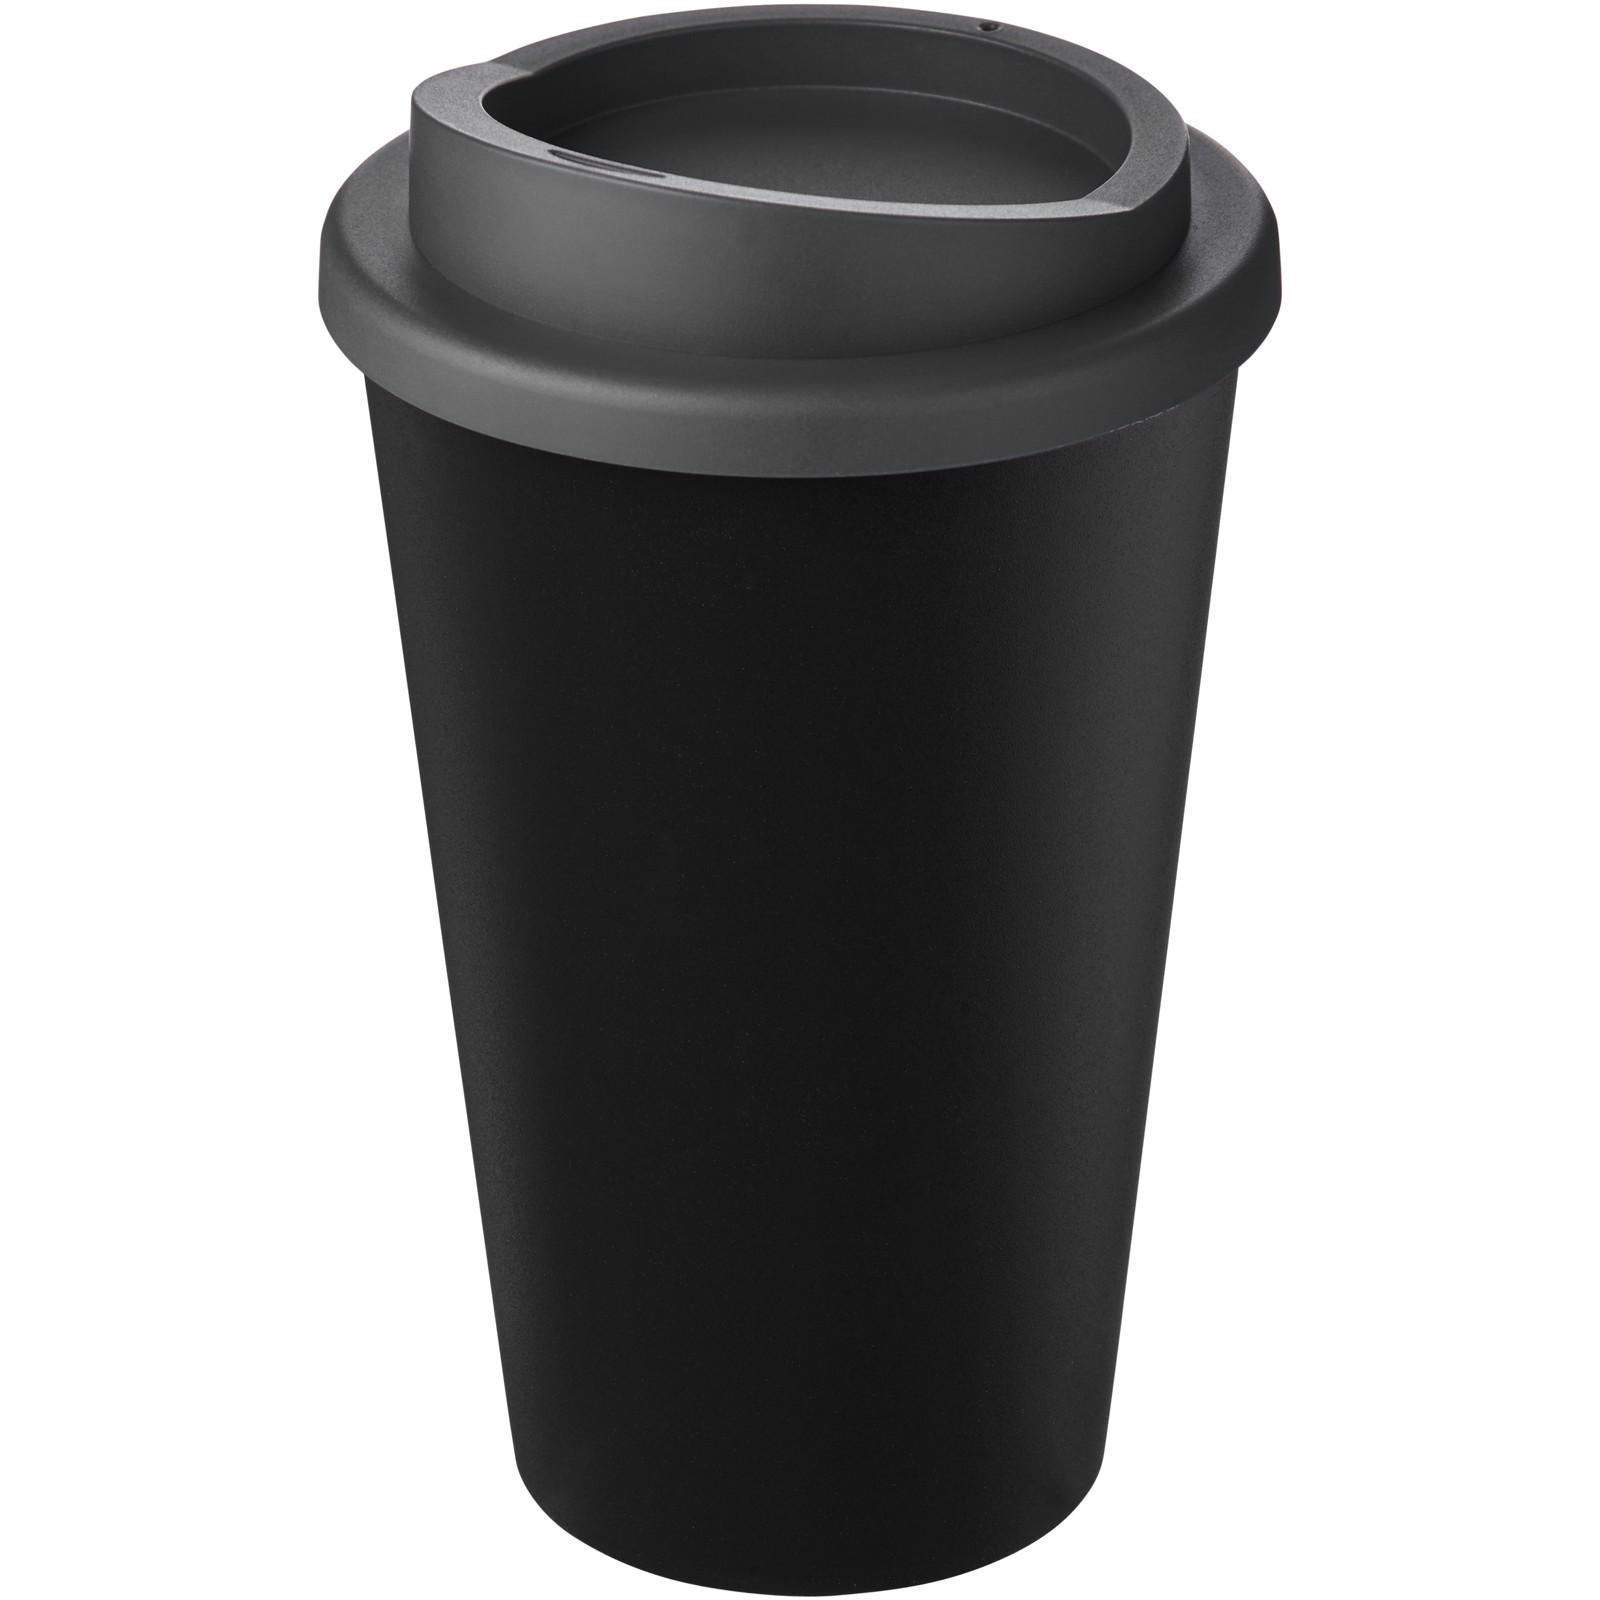 Americano Eco 350 ml recycled tumbler - Solid Black / Grey